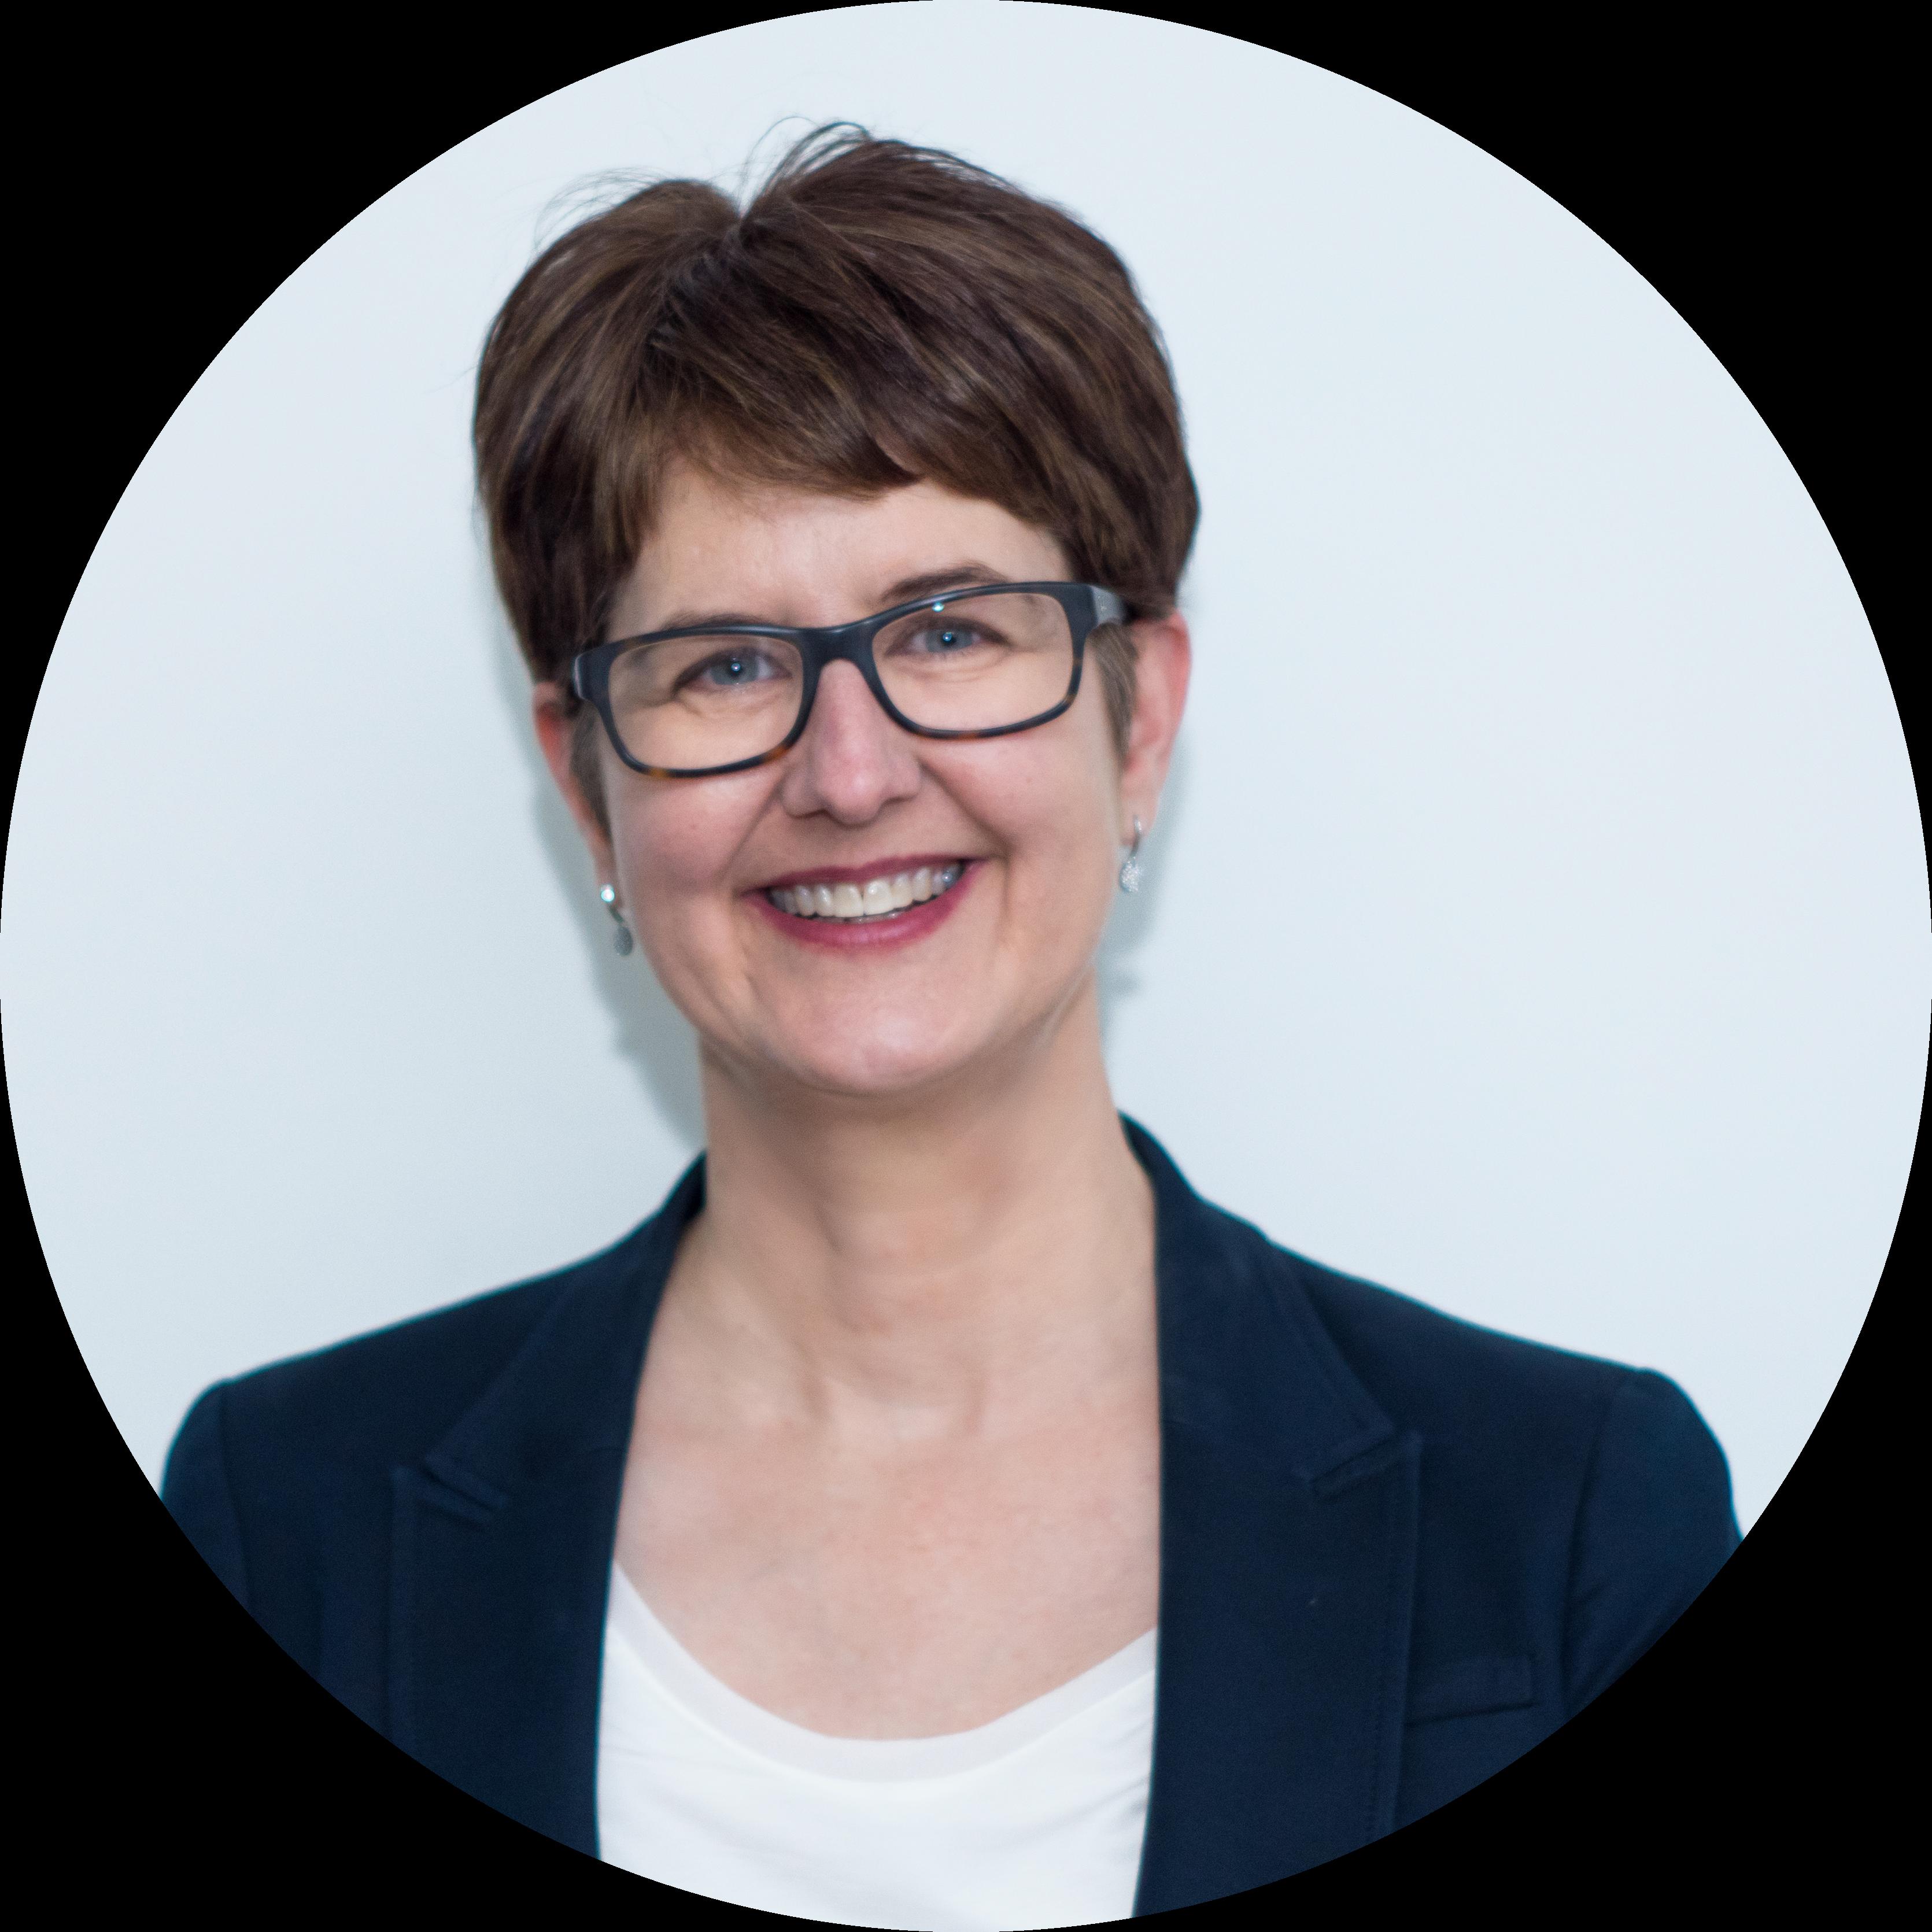 Sarah Gallant, Accent Modification Trainer & Coach